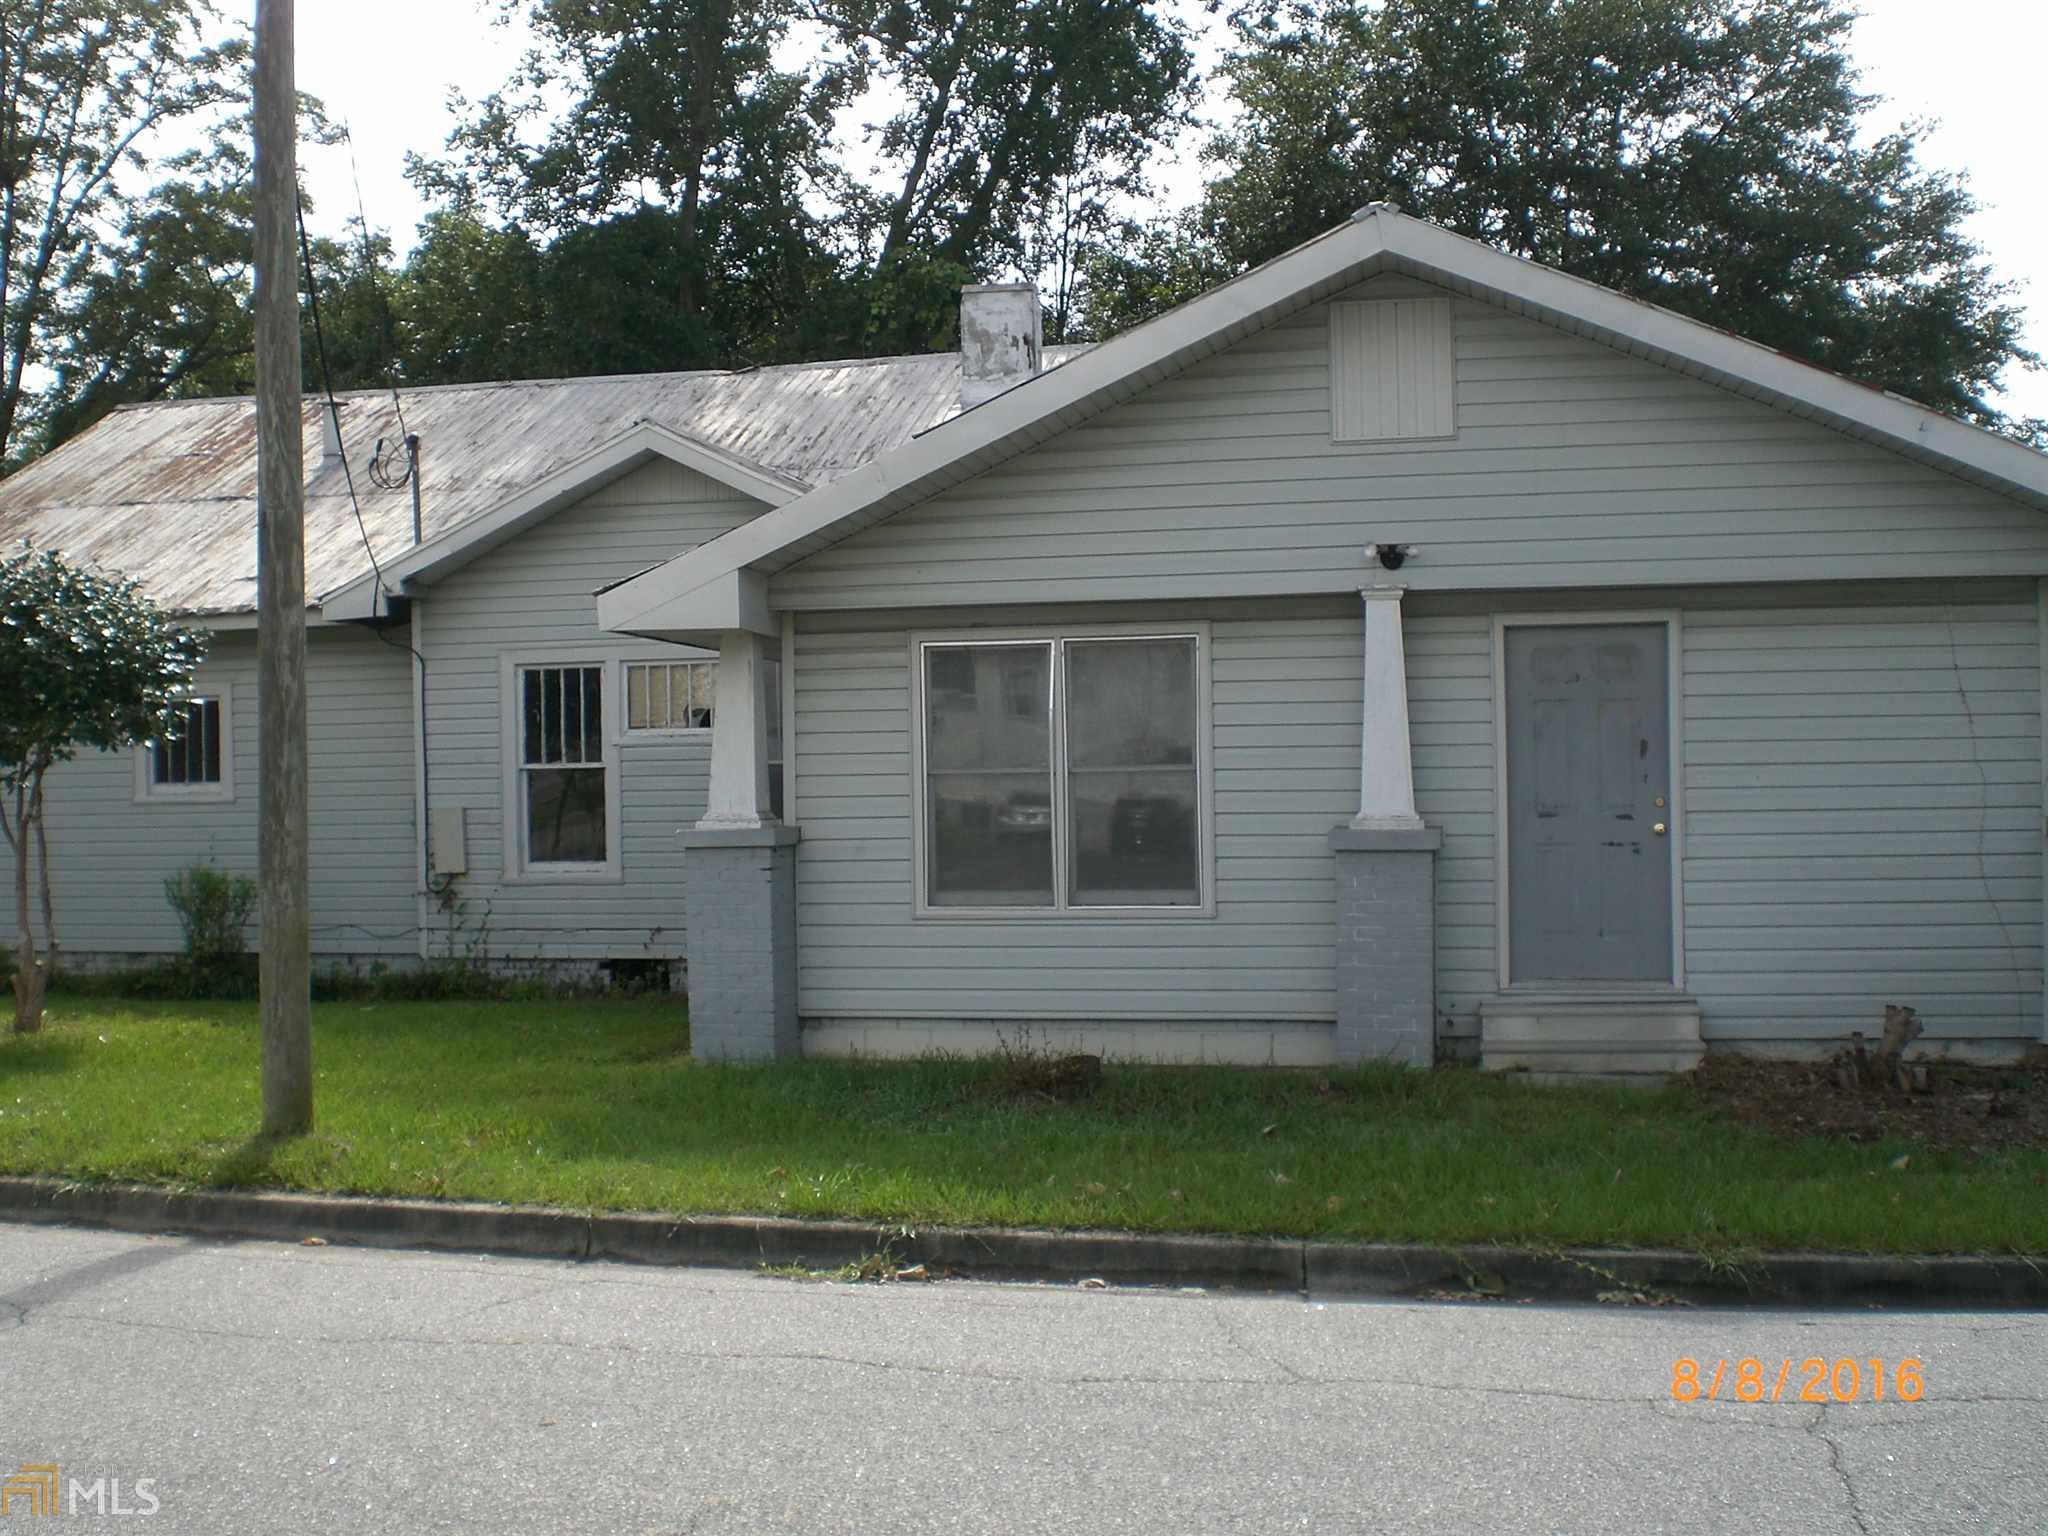 10 Church Street, Statesboro, GA 30458